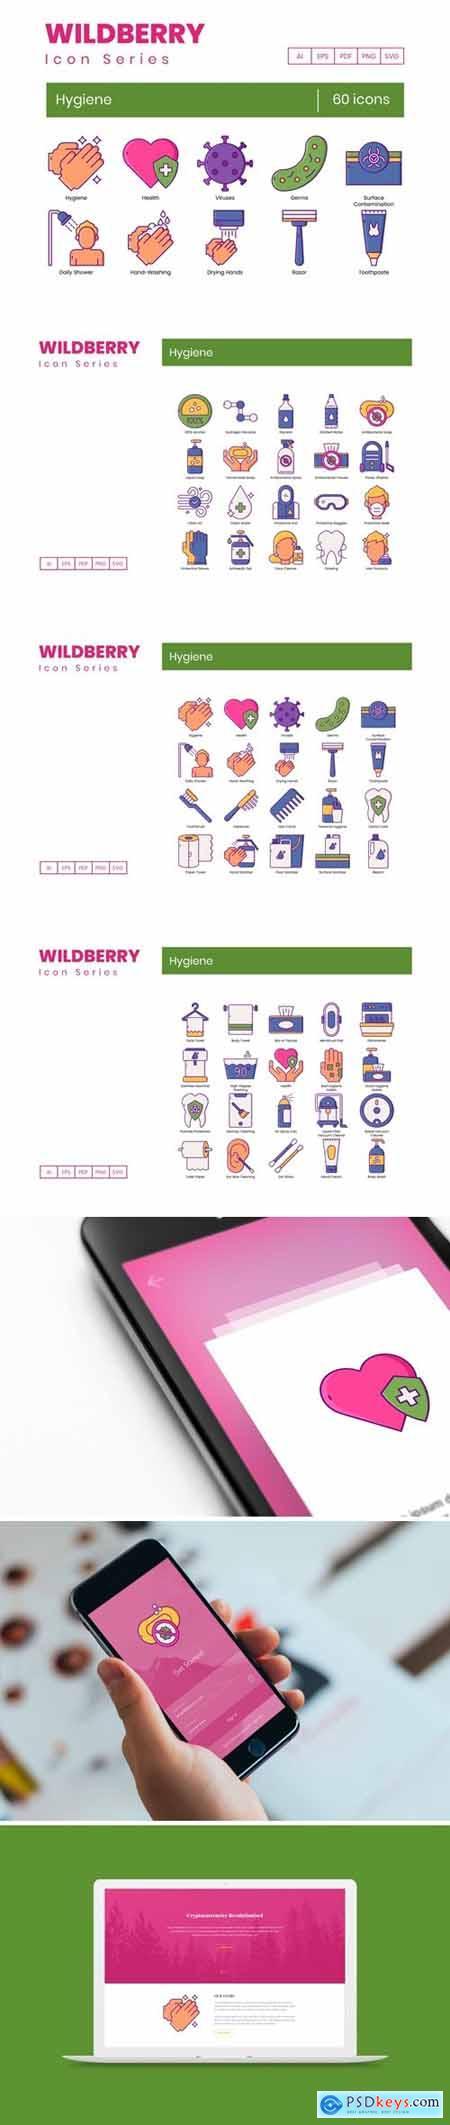 60 Hygiene Icons - Wildberry Series